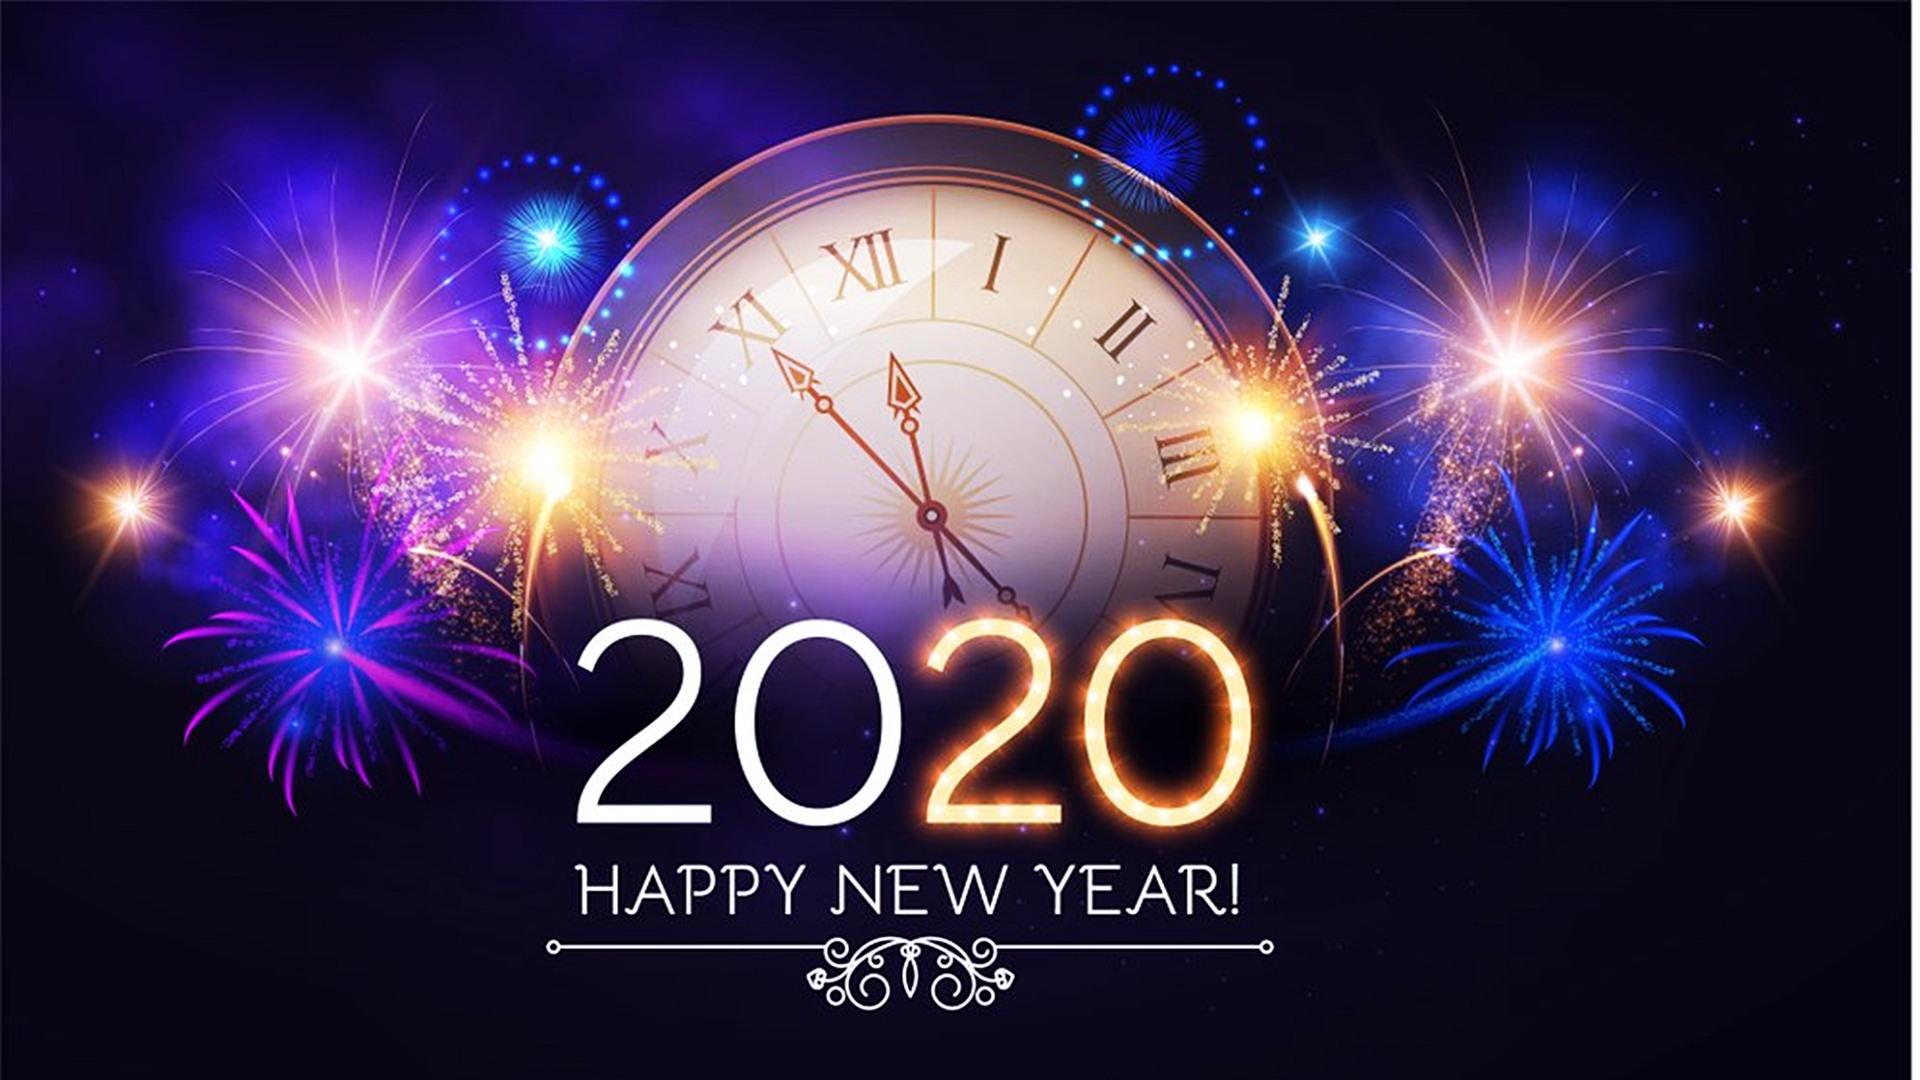 Happy New Year 2020 High Definition Wallpaper 45552   Baltana 1920x1080